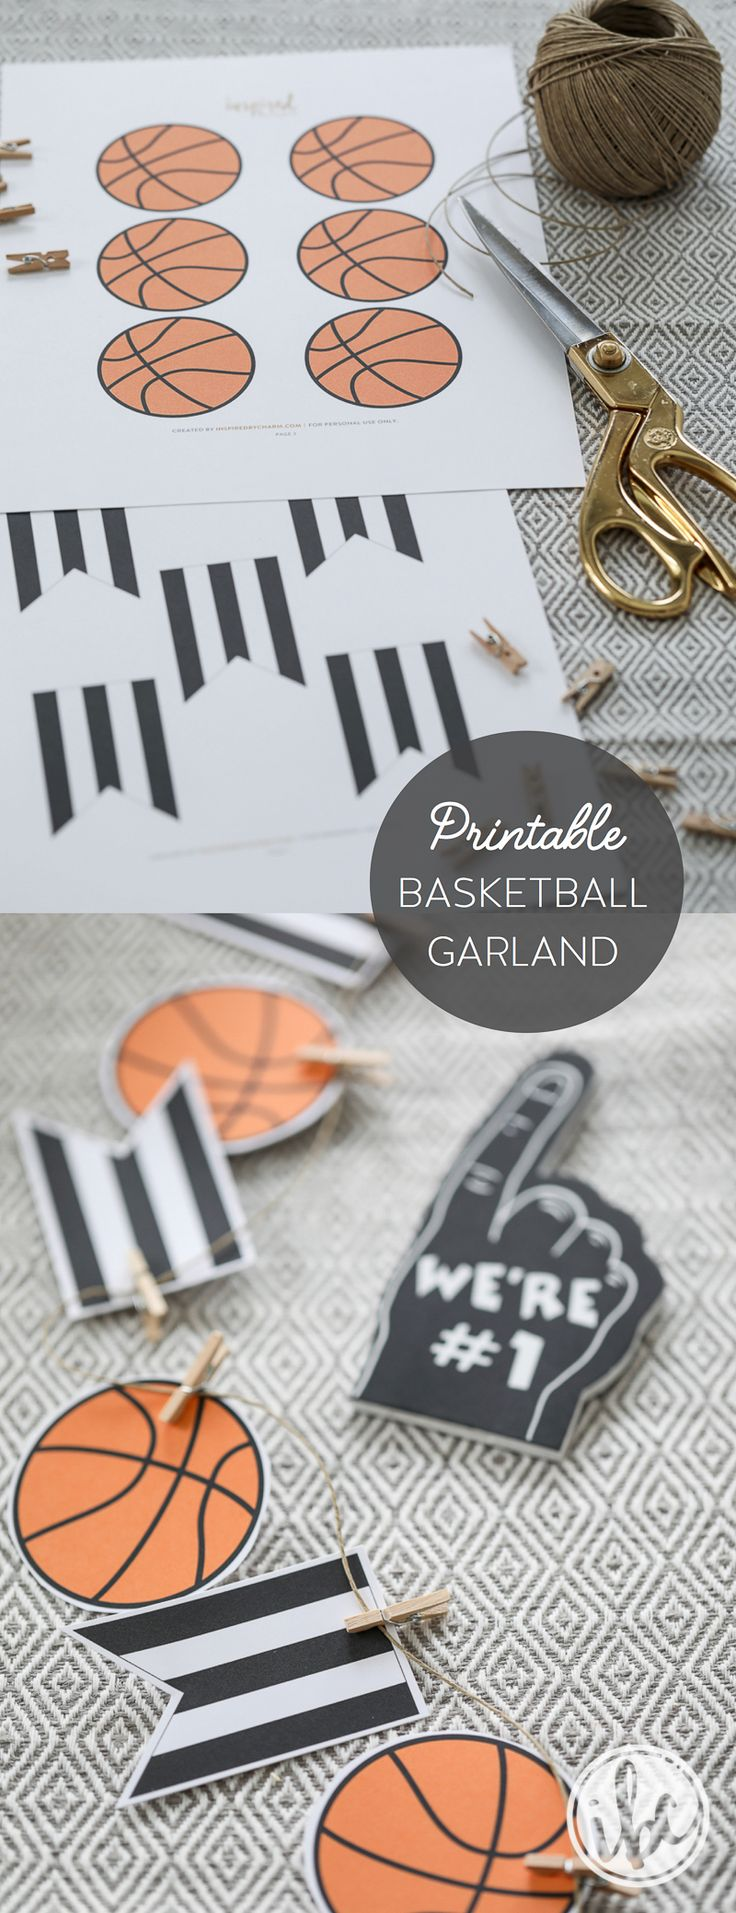 FREE printable basketball party garland download - basketball entertaining party decor ideas